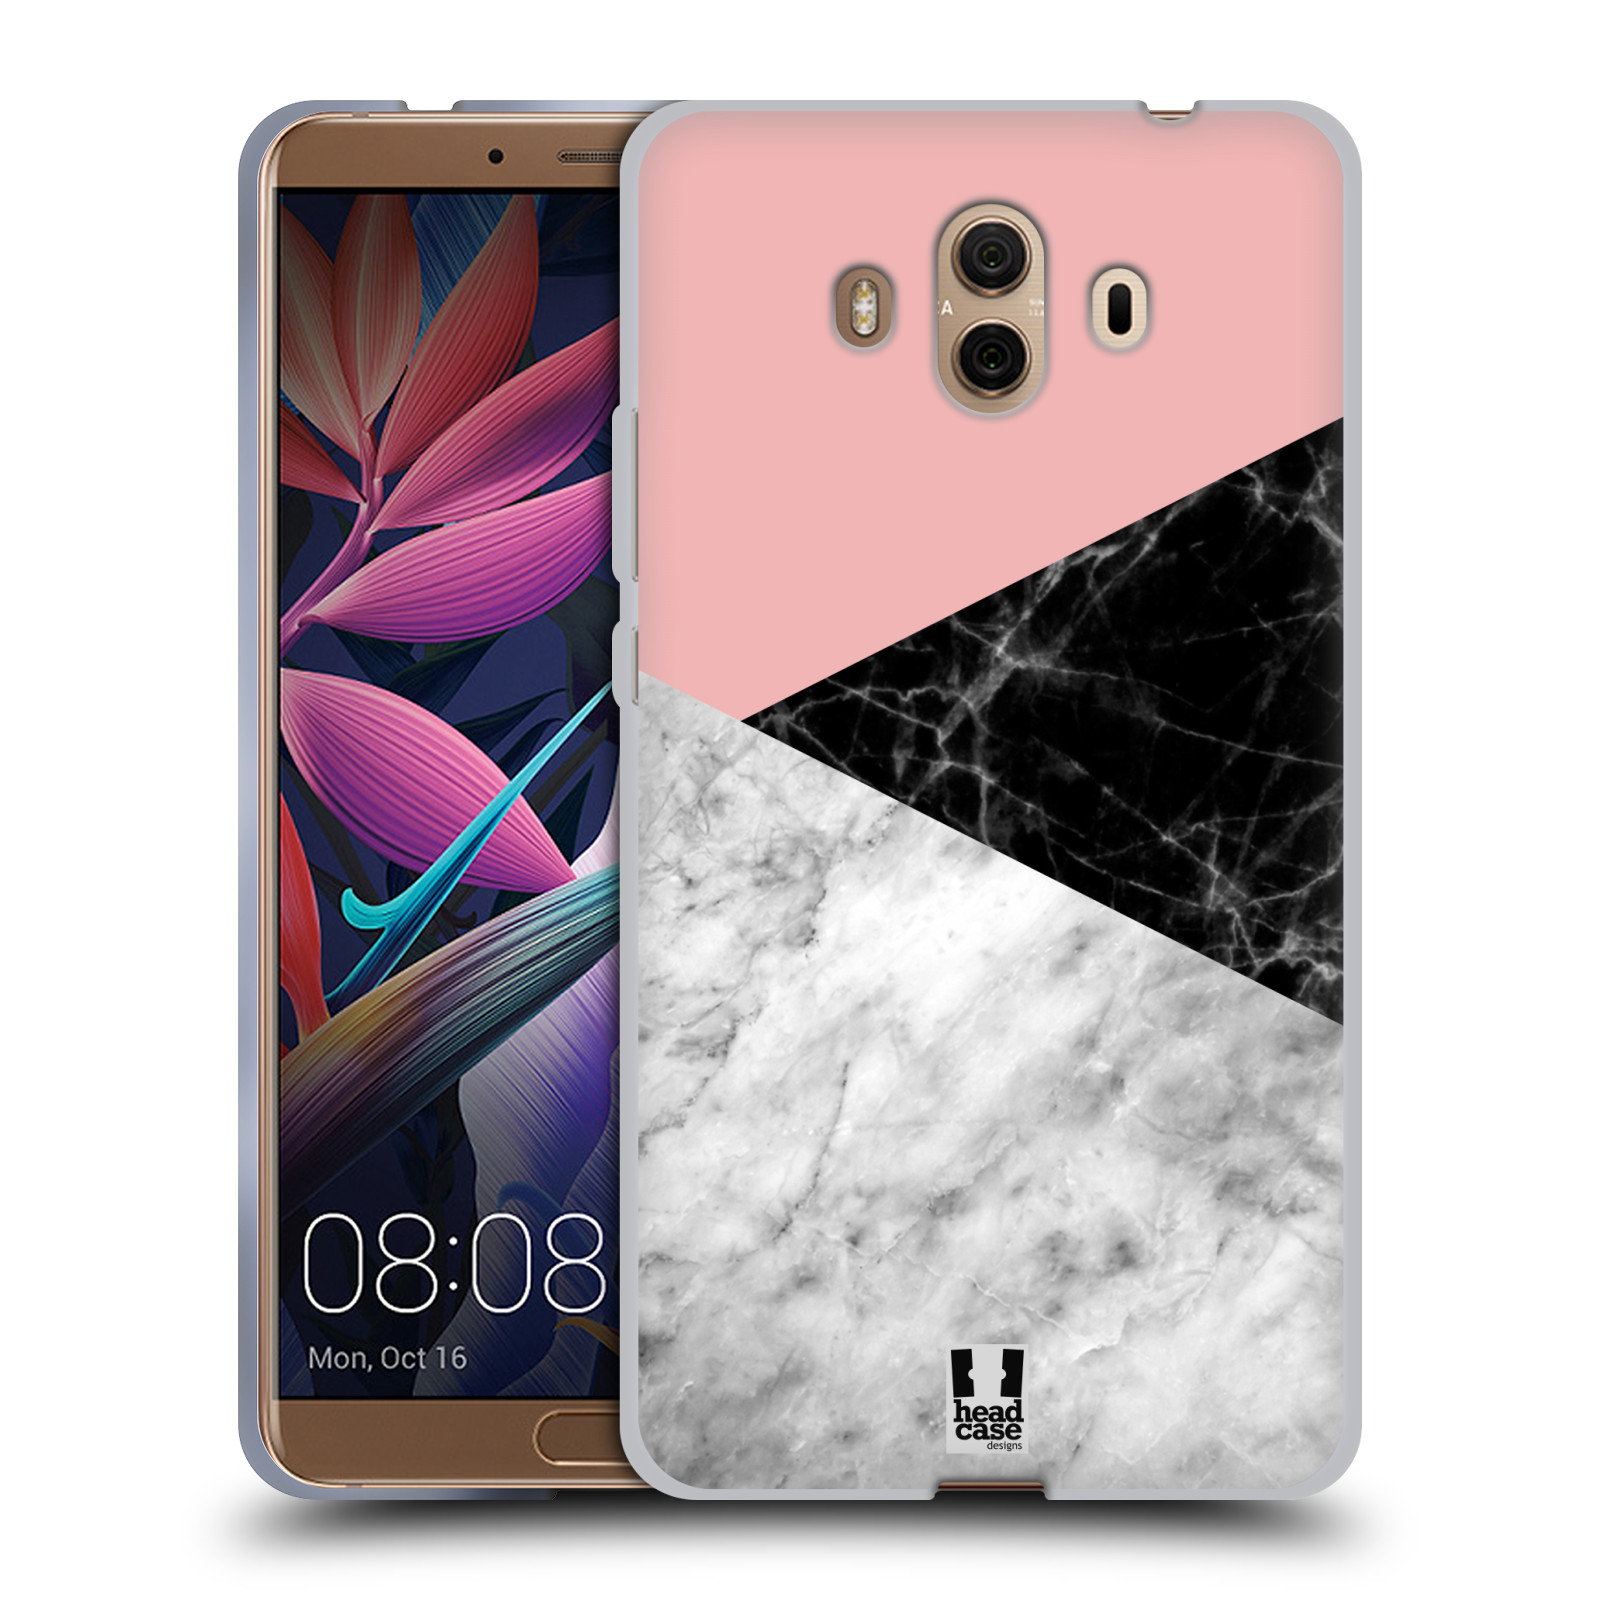 Silikonové pouzdro na mobil Huawei Mate 10 - Head Case - Mramor mix